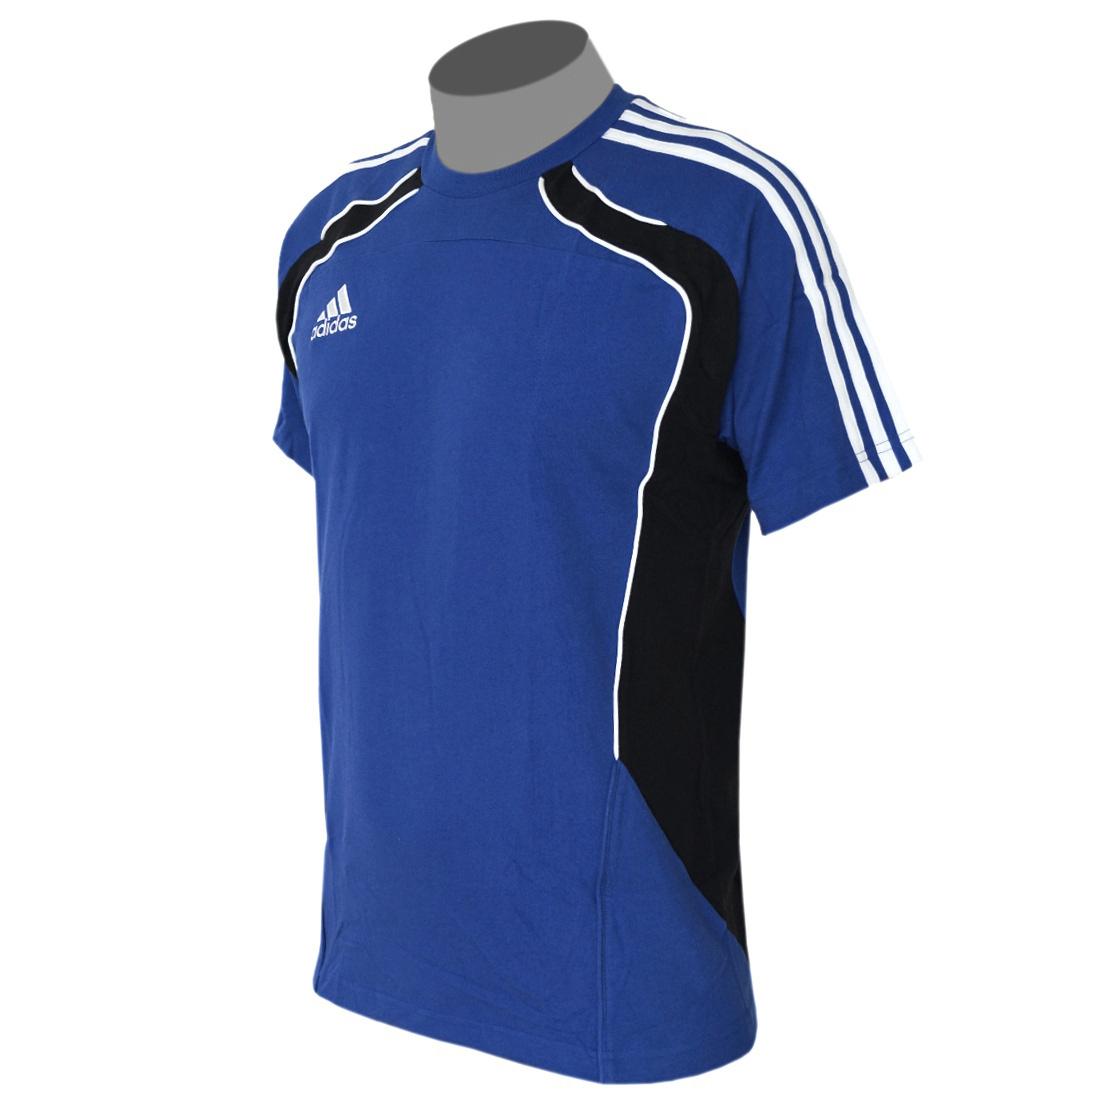 adidas condivo herren t shirt blau trikot trainingsshirt baumwolle ebay. Black Bedroom Furniture Sets. Home Design Ideas